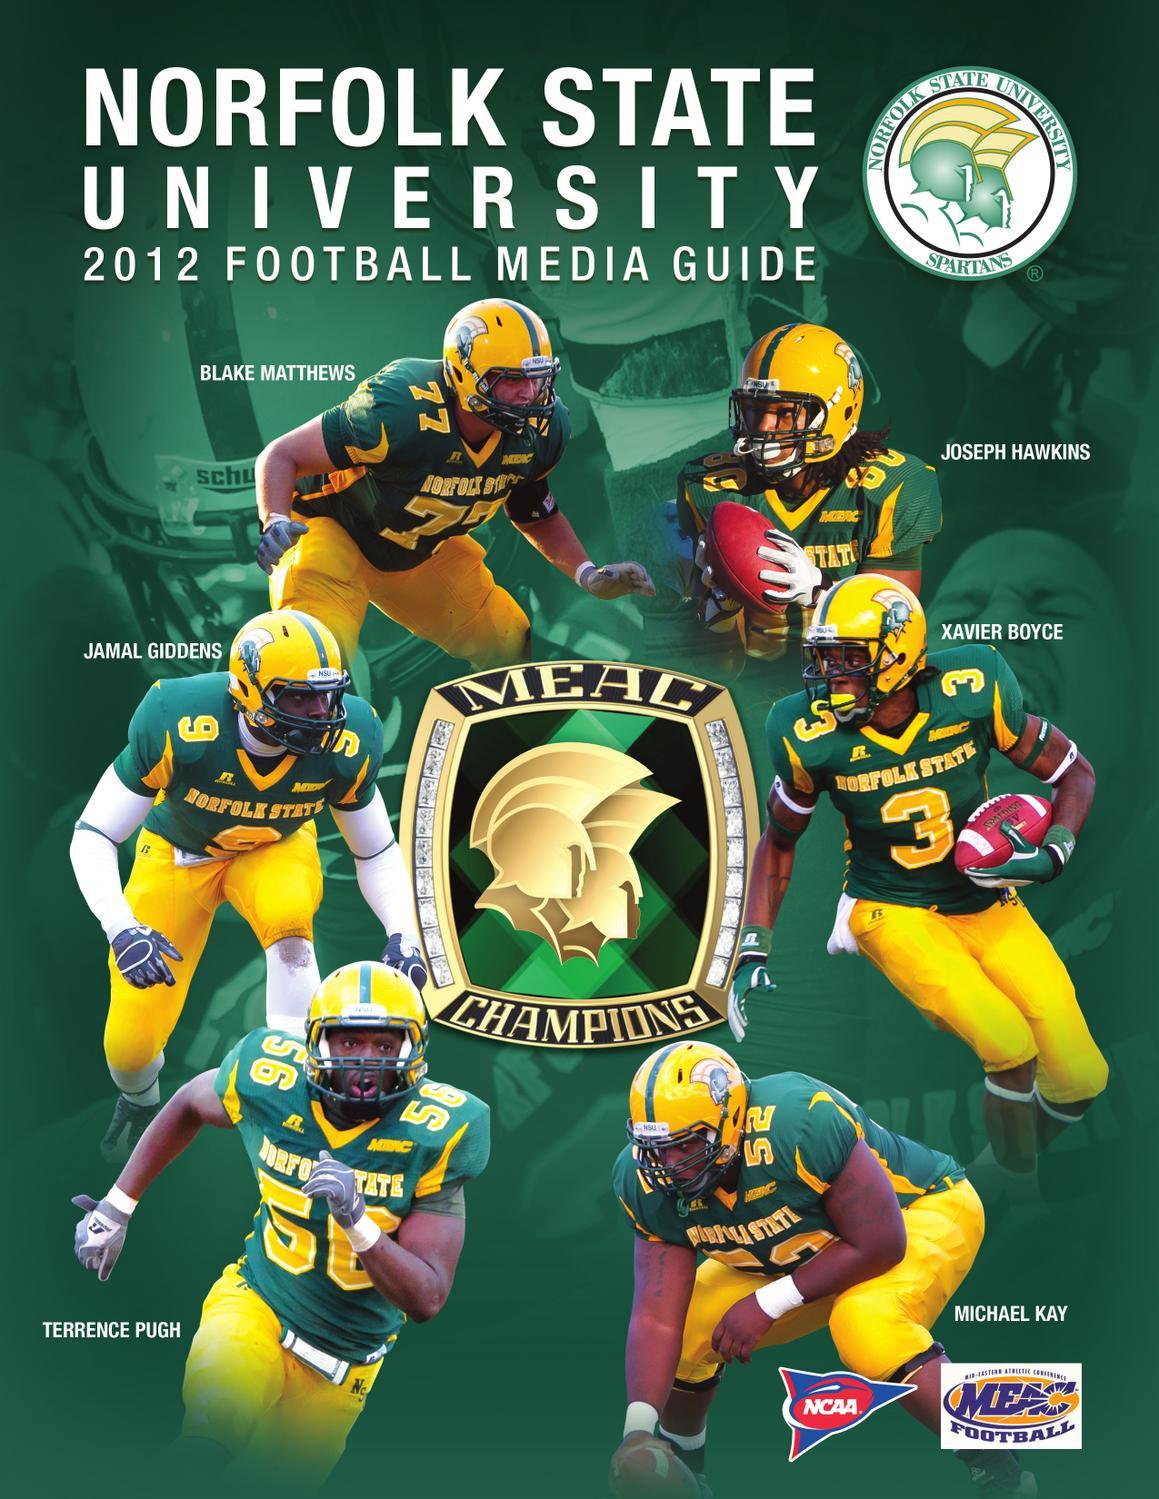 2012 NSU Football Media Guide by Matt Michalec - Issuu